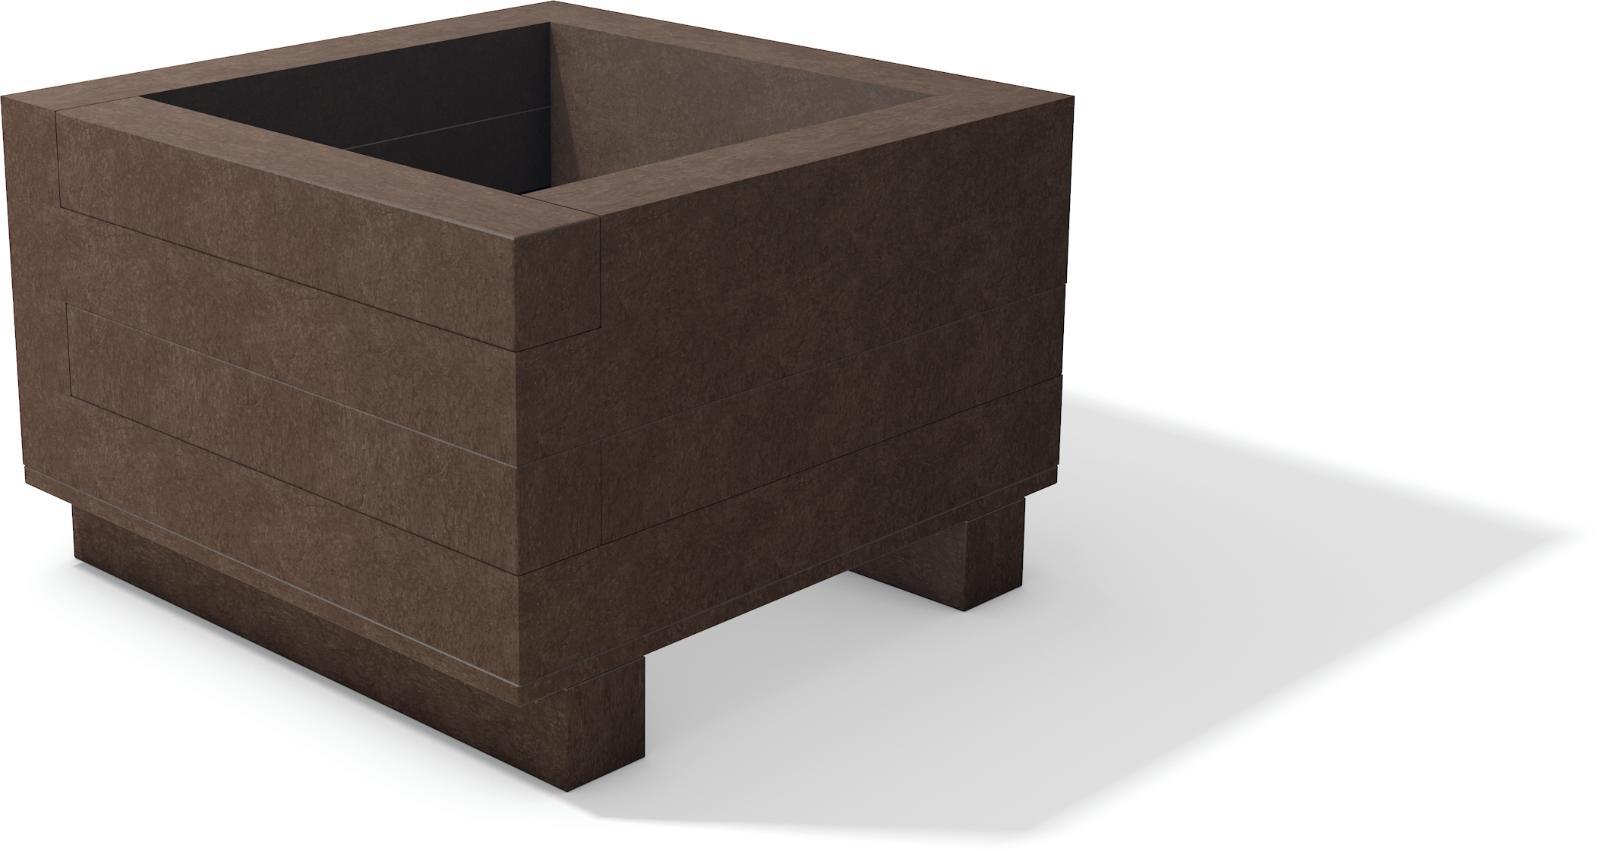 pflanzk bel blumenk bel f r den st dtischen bedarf au en amsdirekt. Black Bedroom Furniture Sets. Home Design Ideas